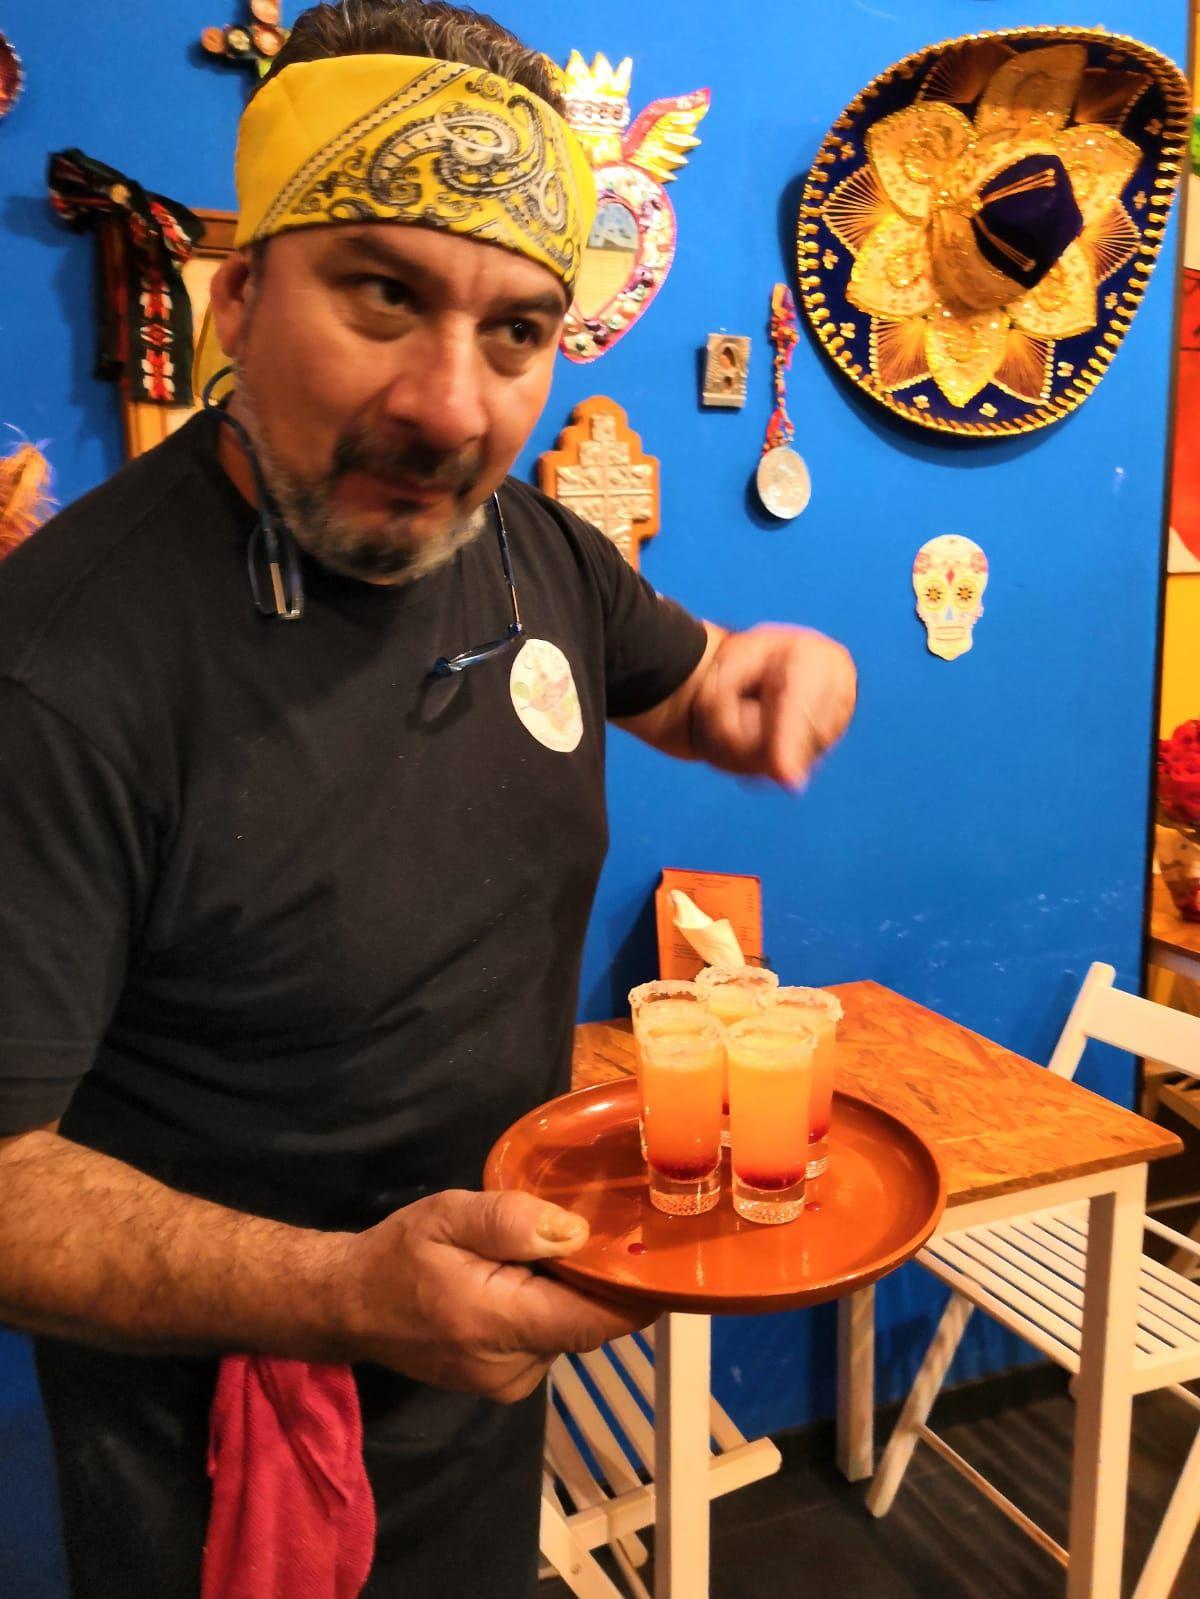 Foto 53 de Restaurante mexicano en  | Cantina La Catrina